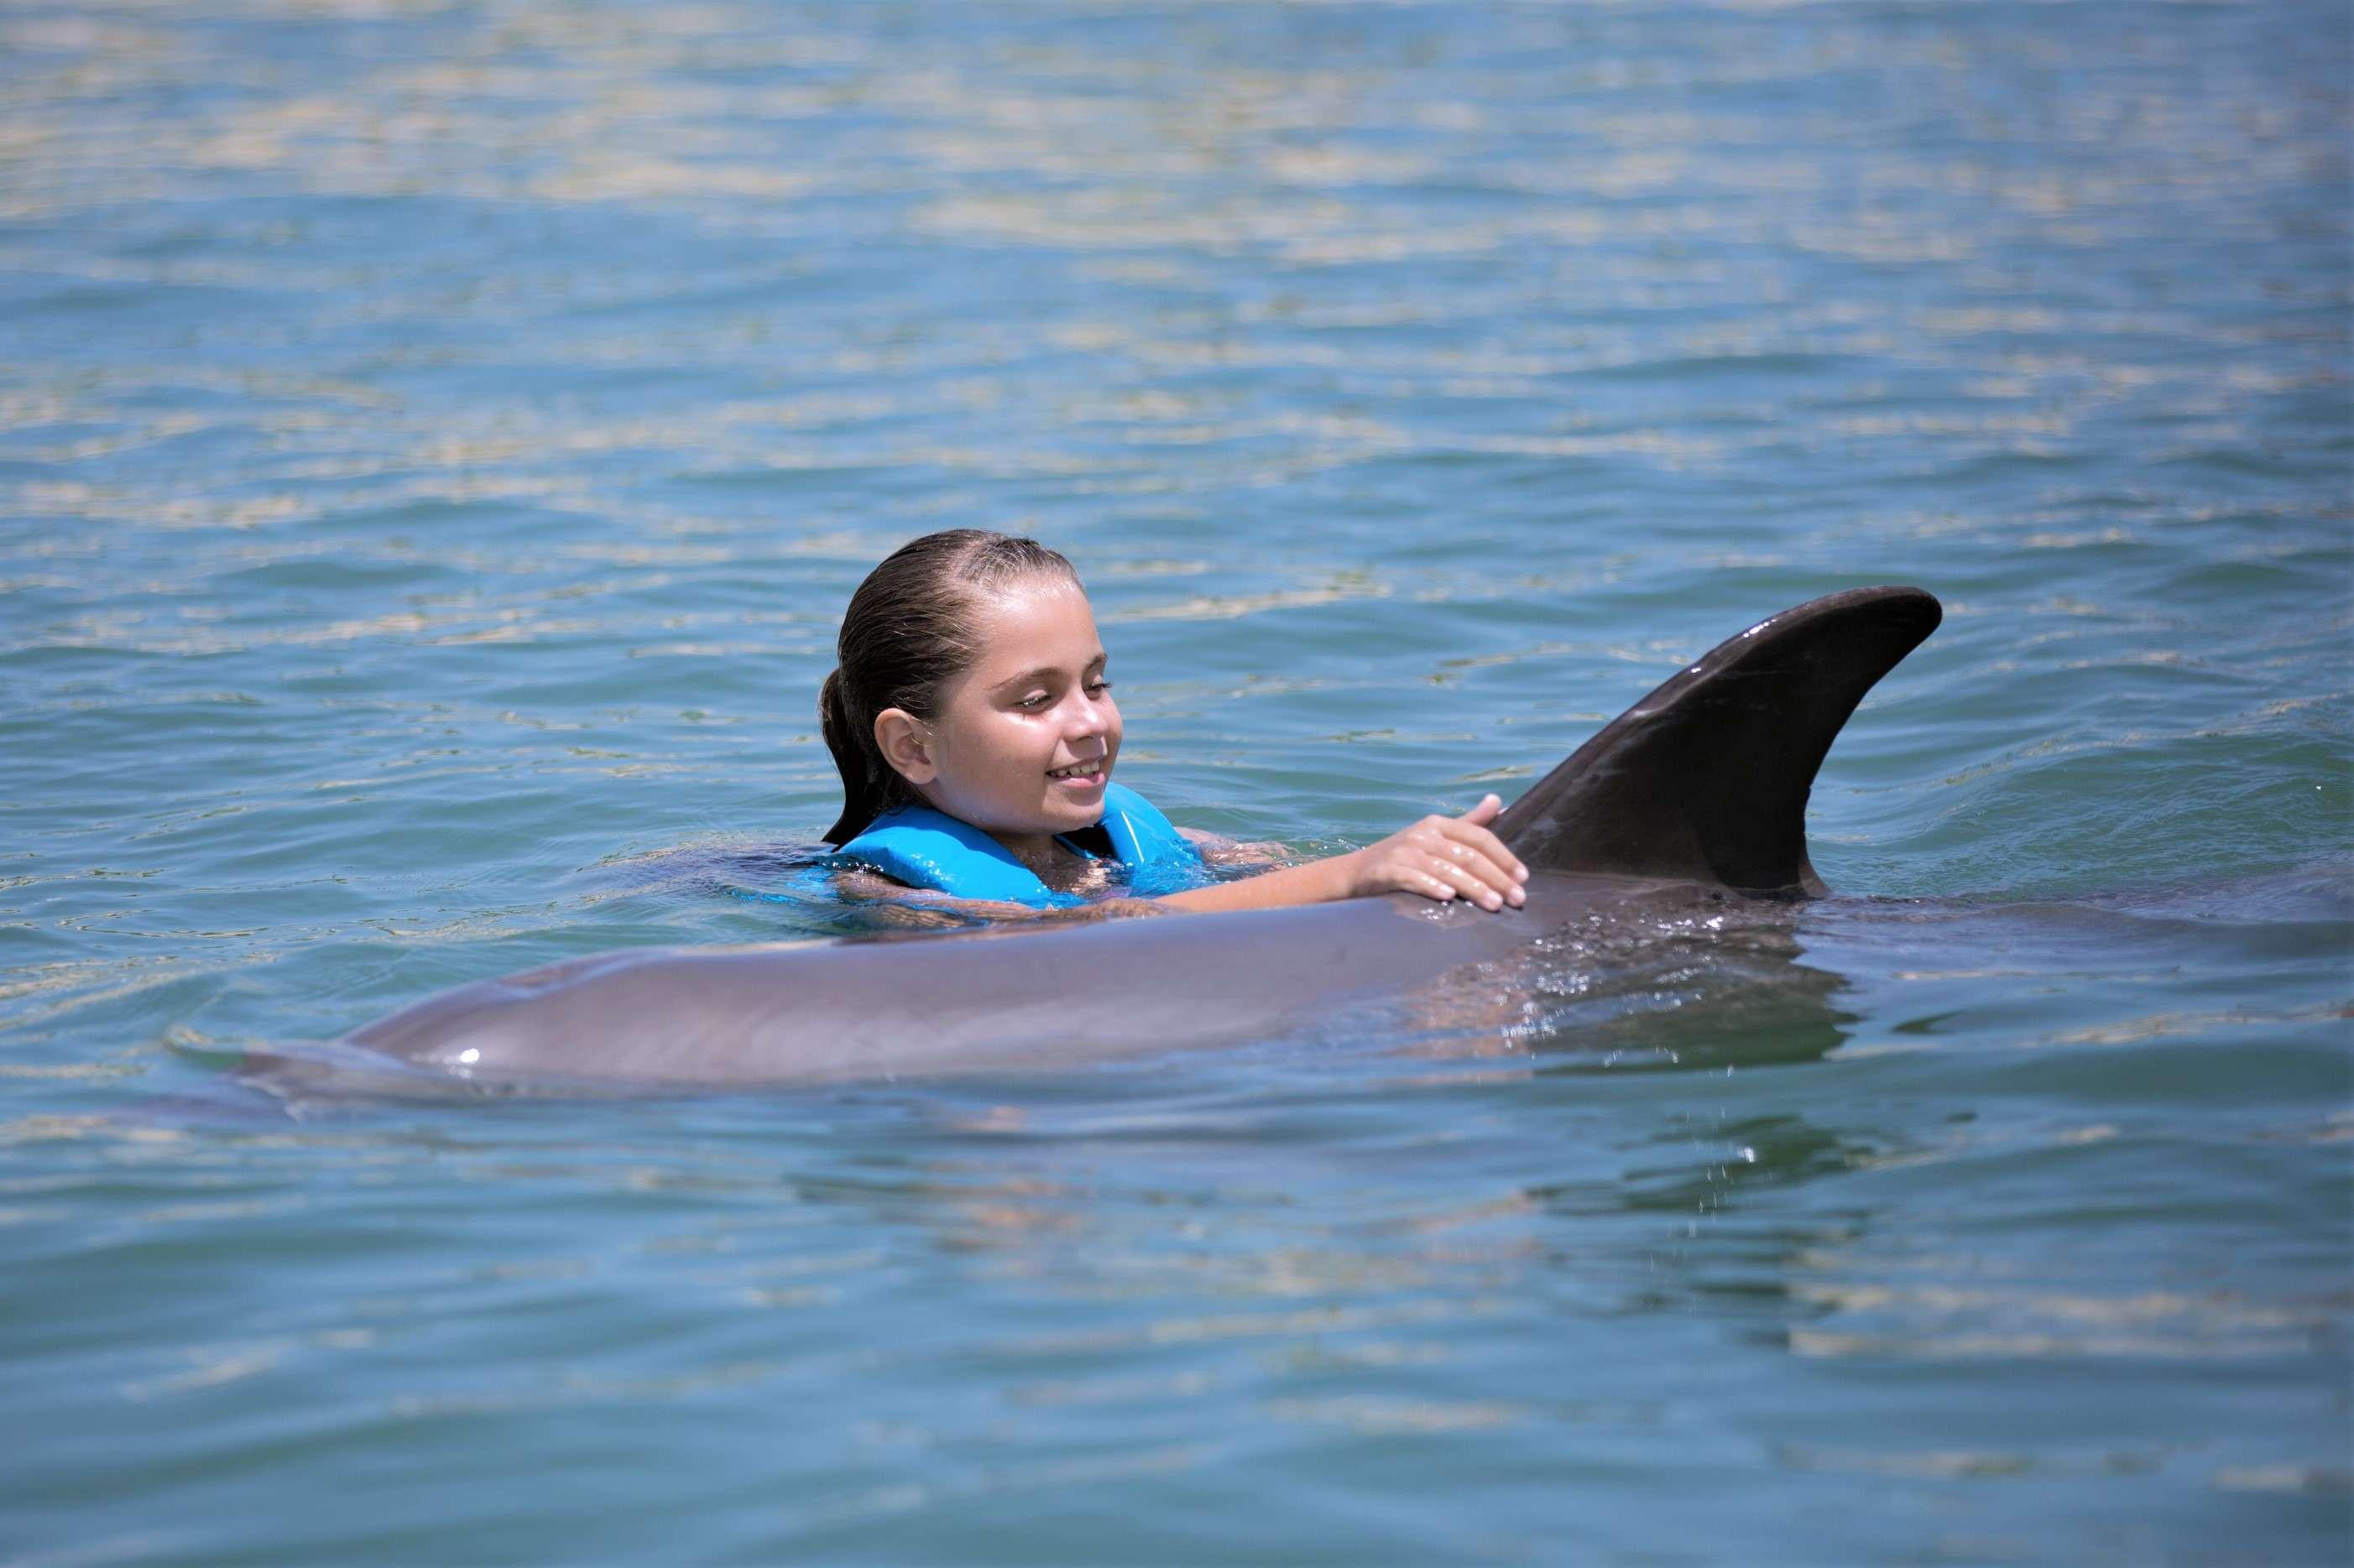 México Travel Solutions Dolphin Splash Punta Cancun